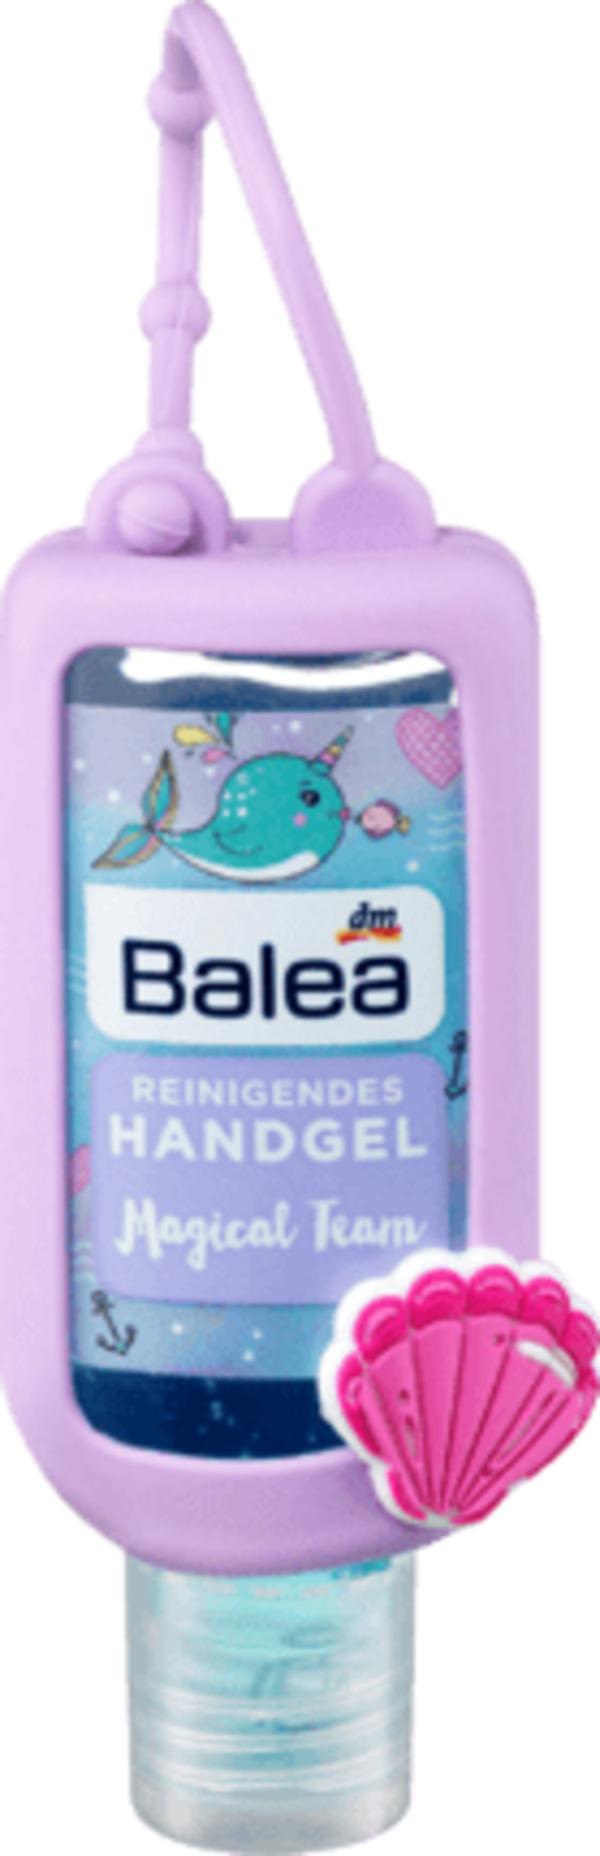 Balea Hygiene-Handgel Narwal